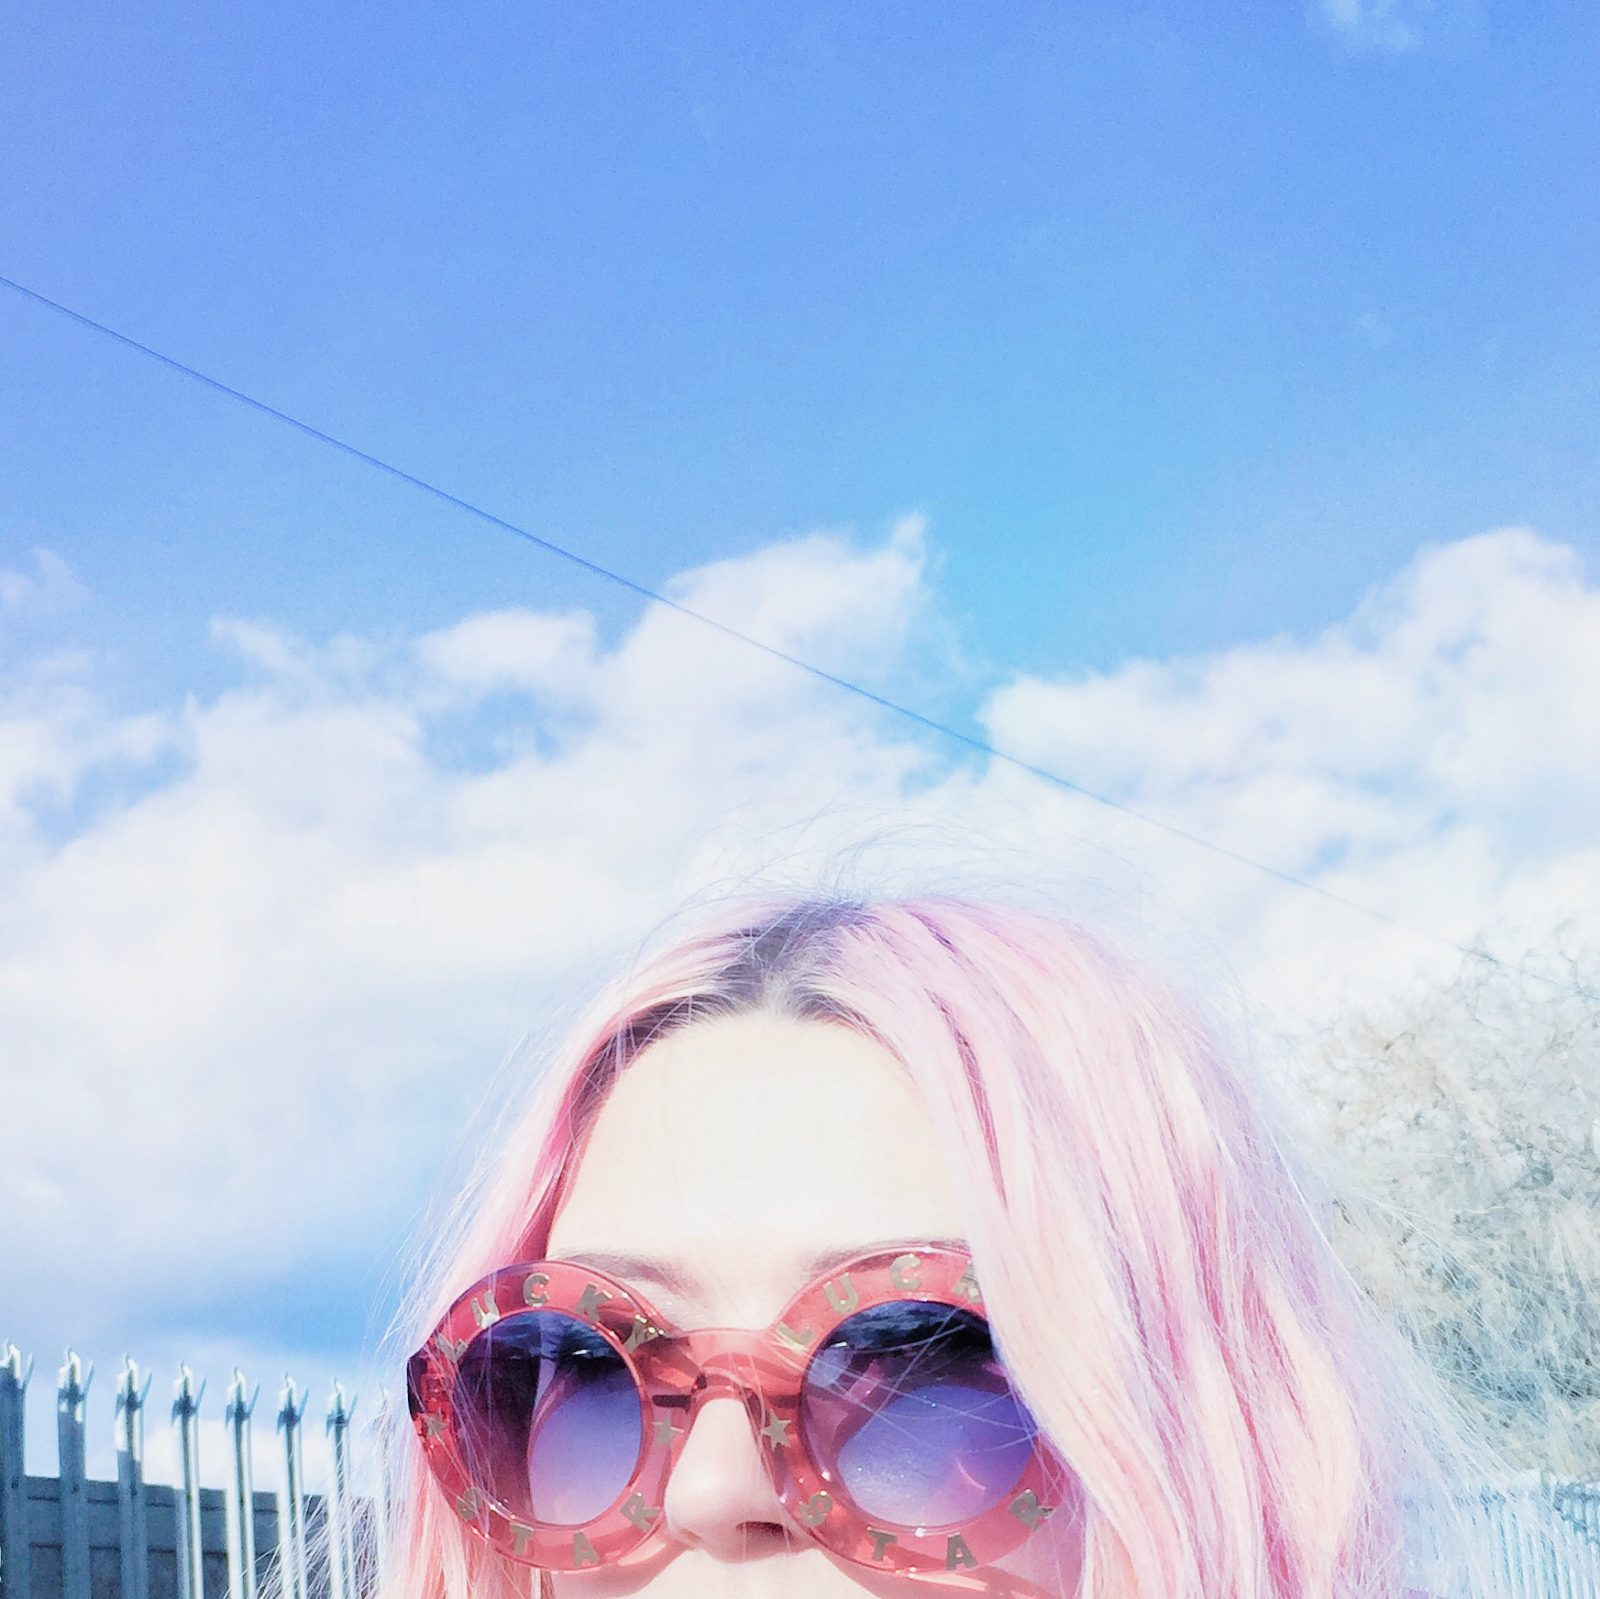 pink puffer jacket, MISSGUIDED JACKET, poppy lissiman sunglasses, festival shorts, pink hair, purple hair, alt blogger